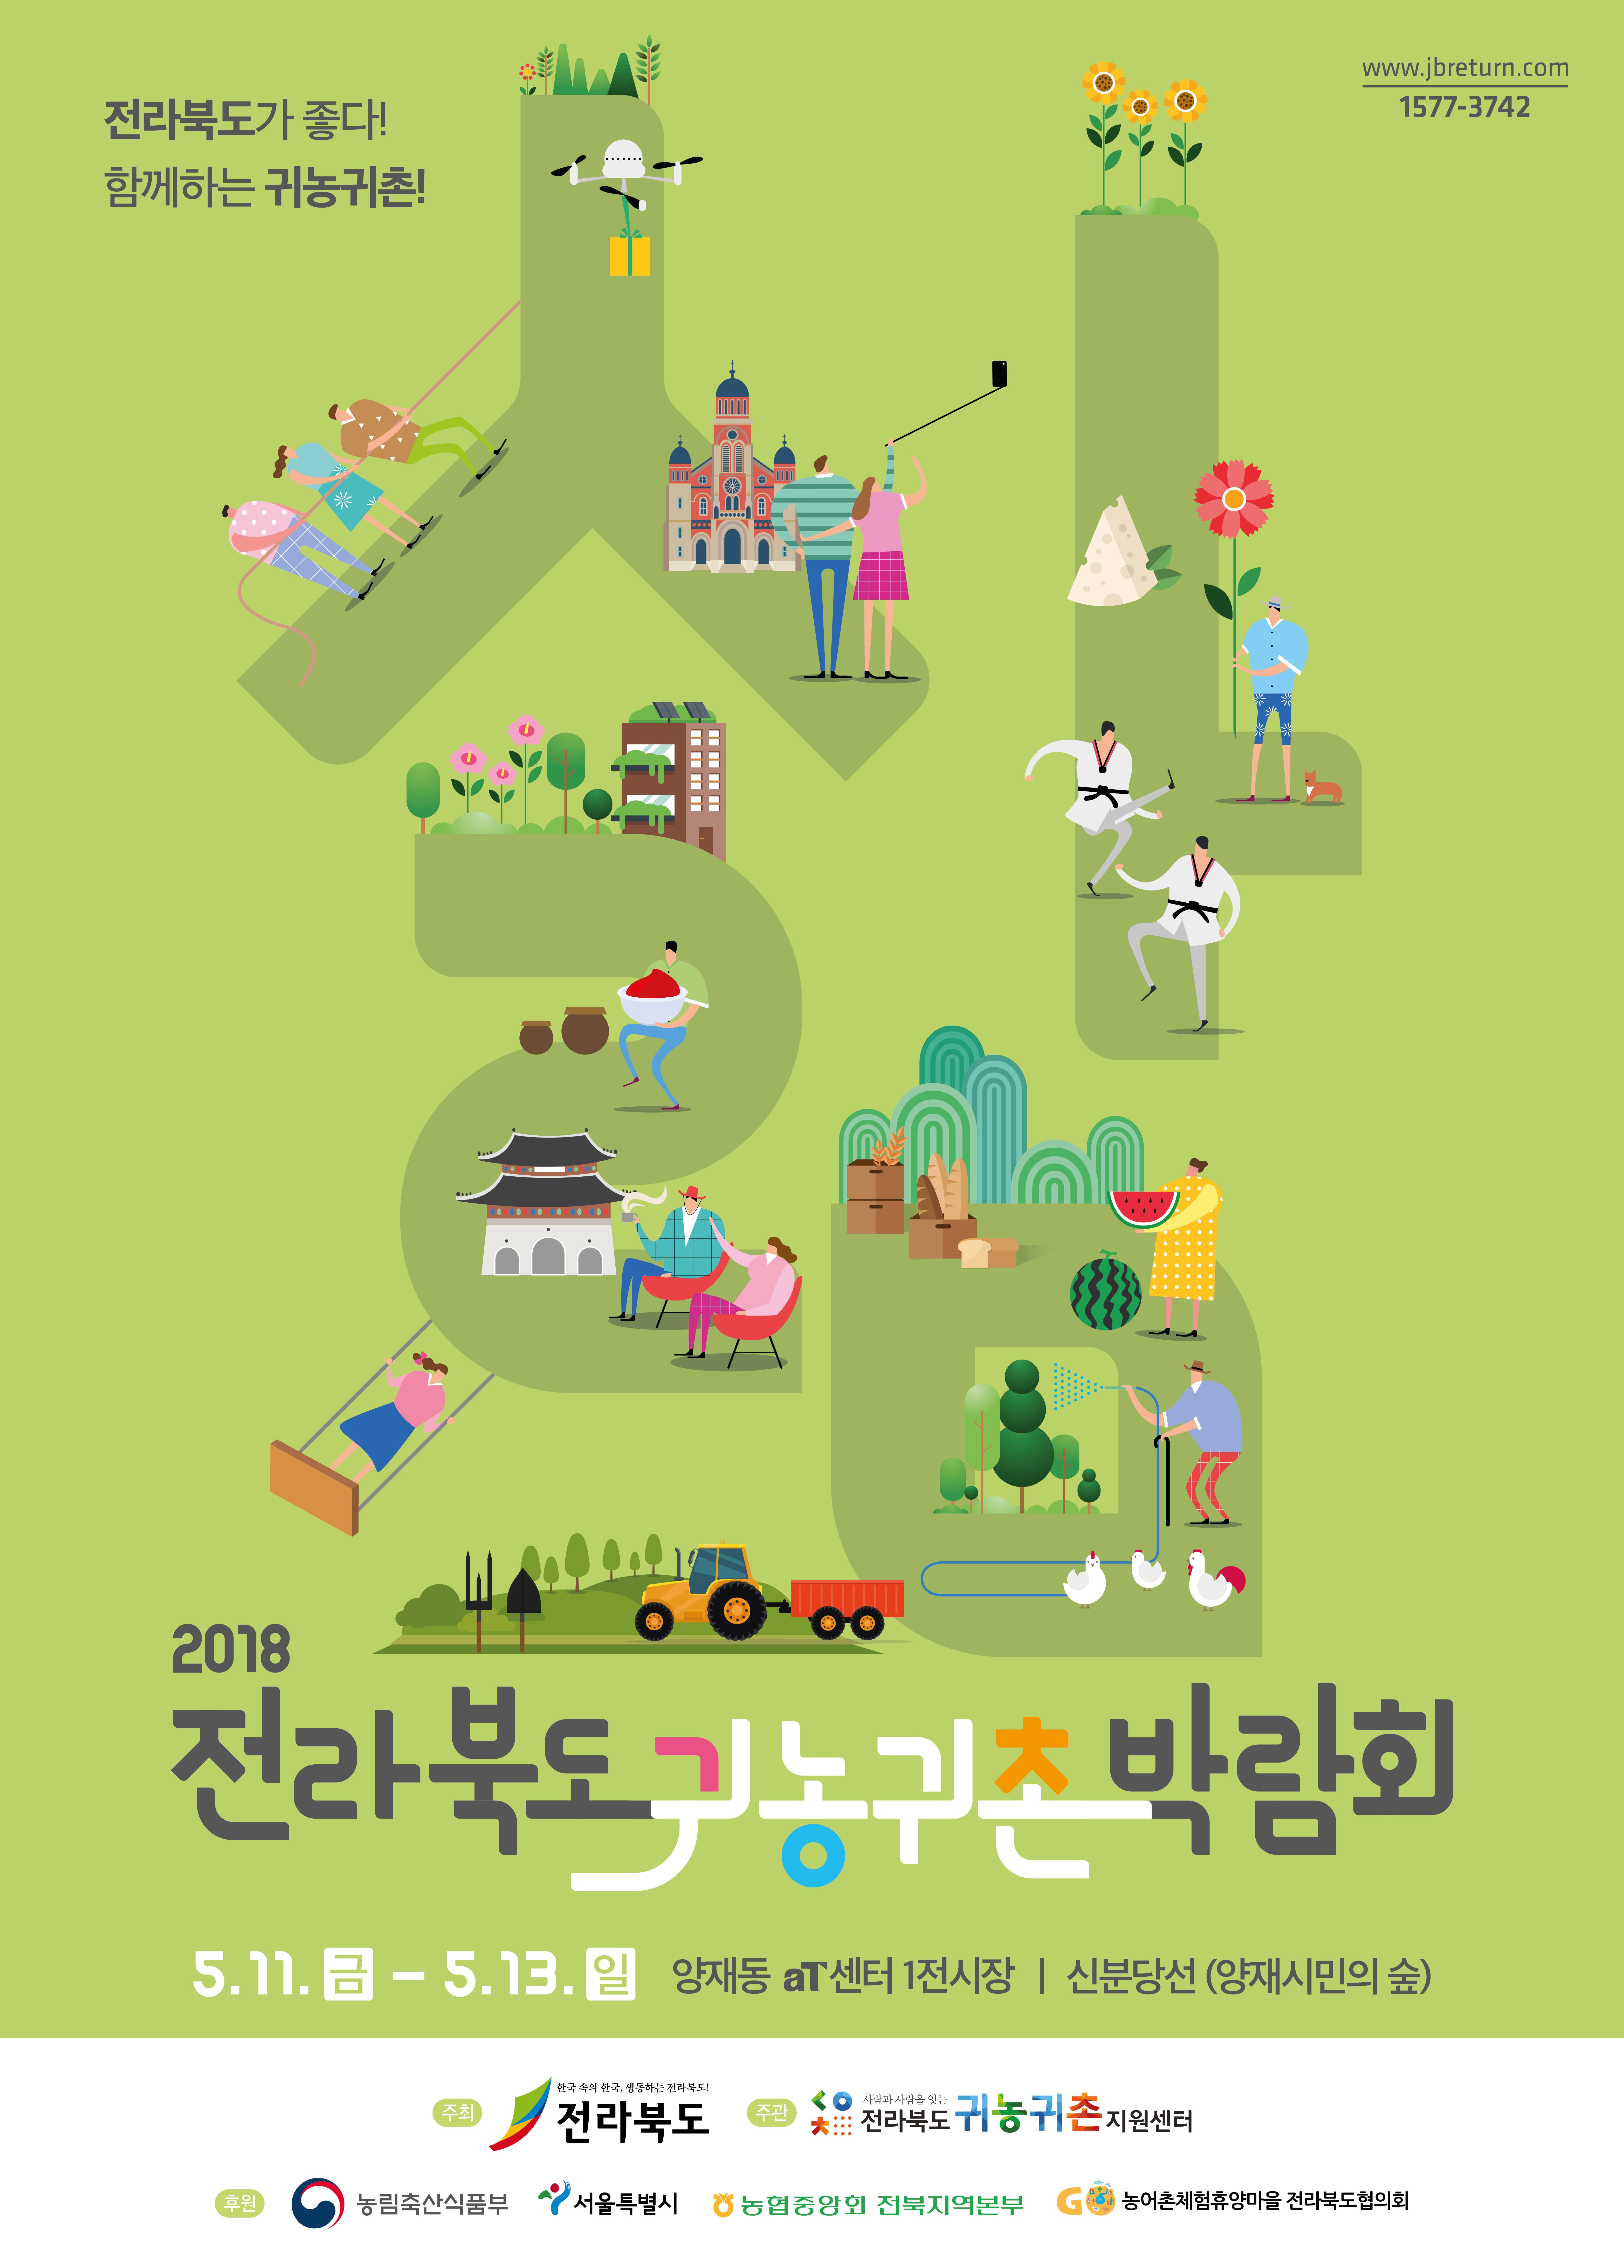 2018_jbreturn_poster.png